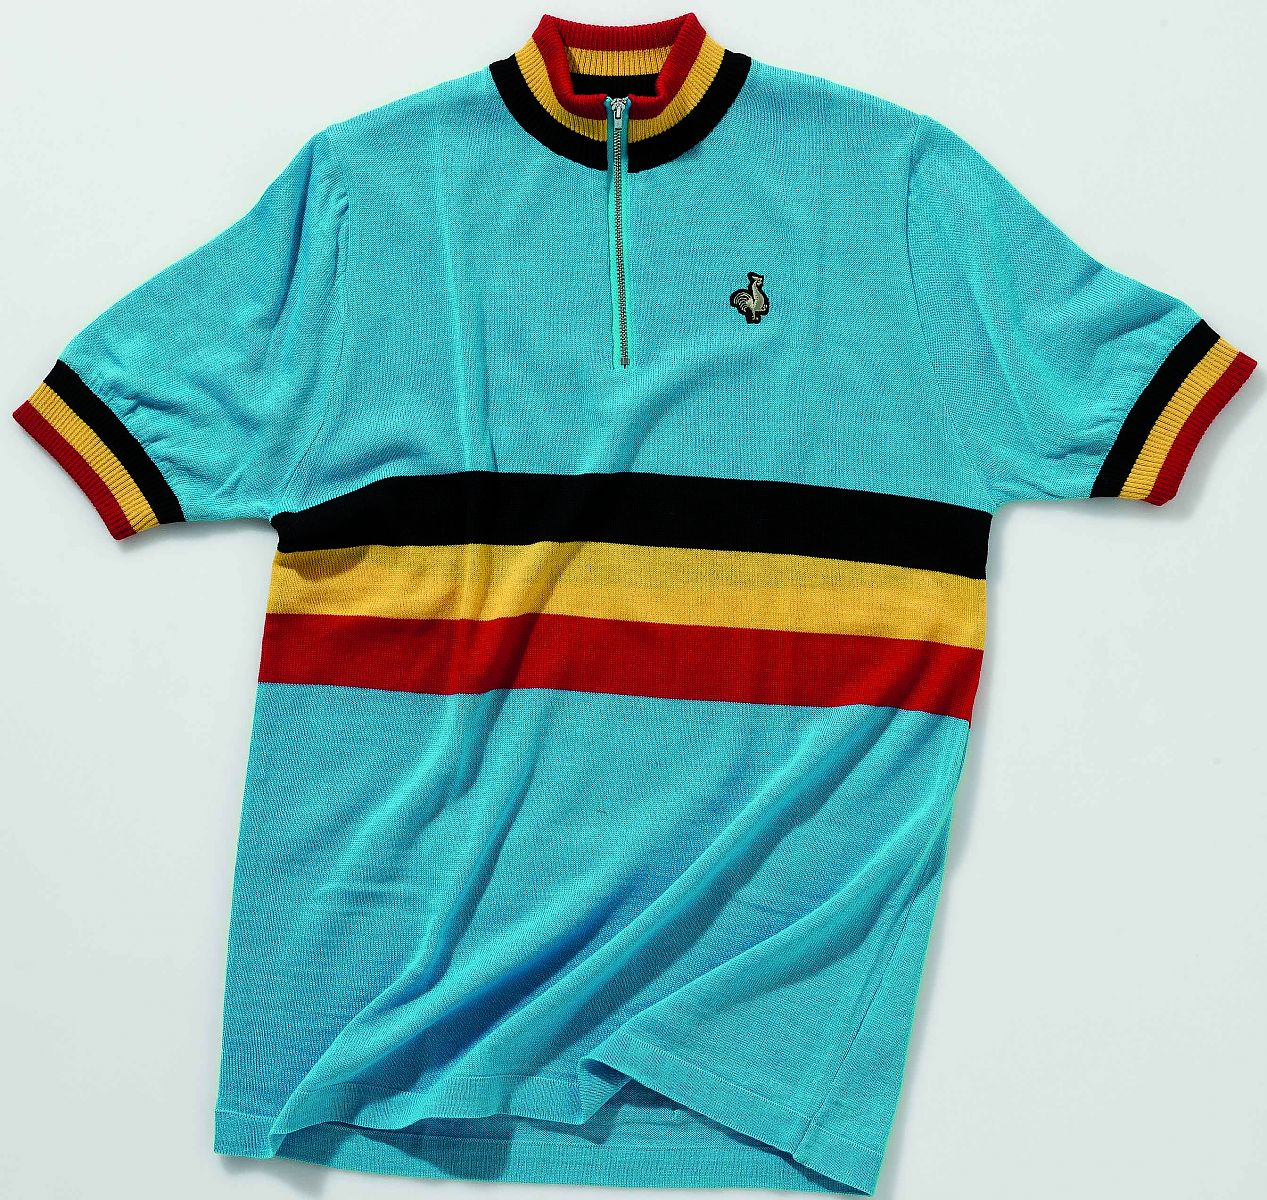 95f63989f De Marchi offers replica jersey series